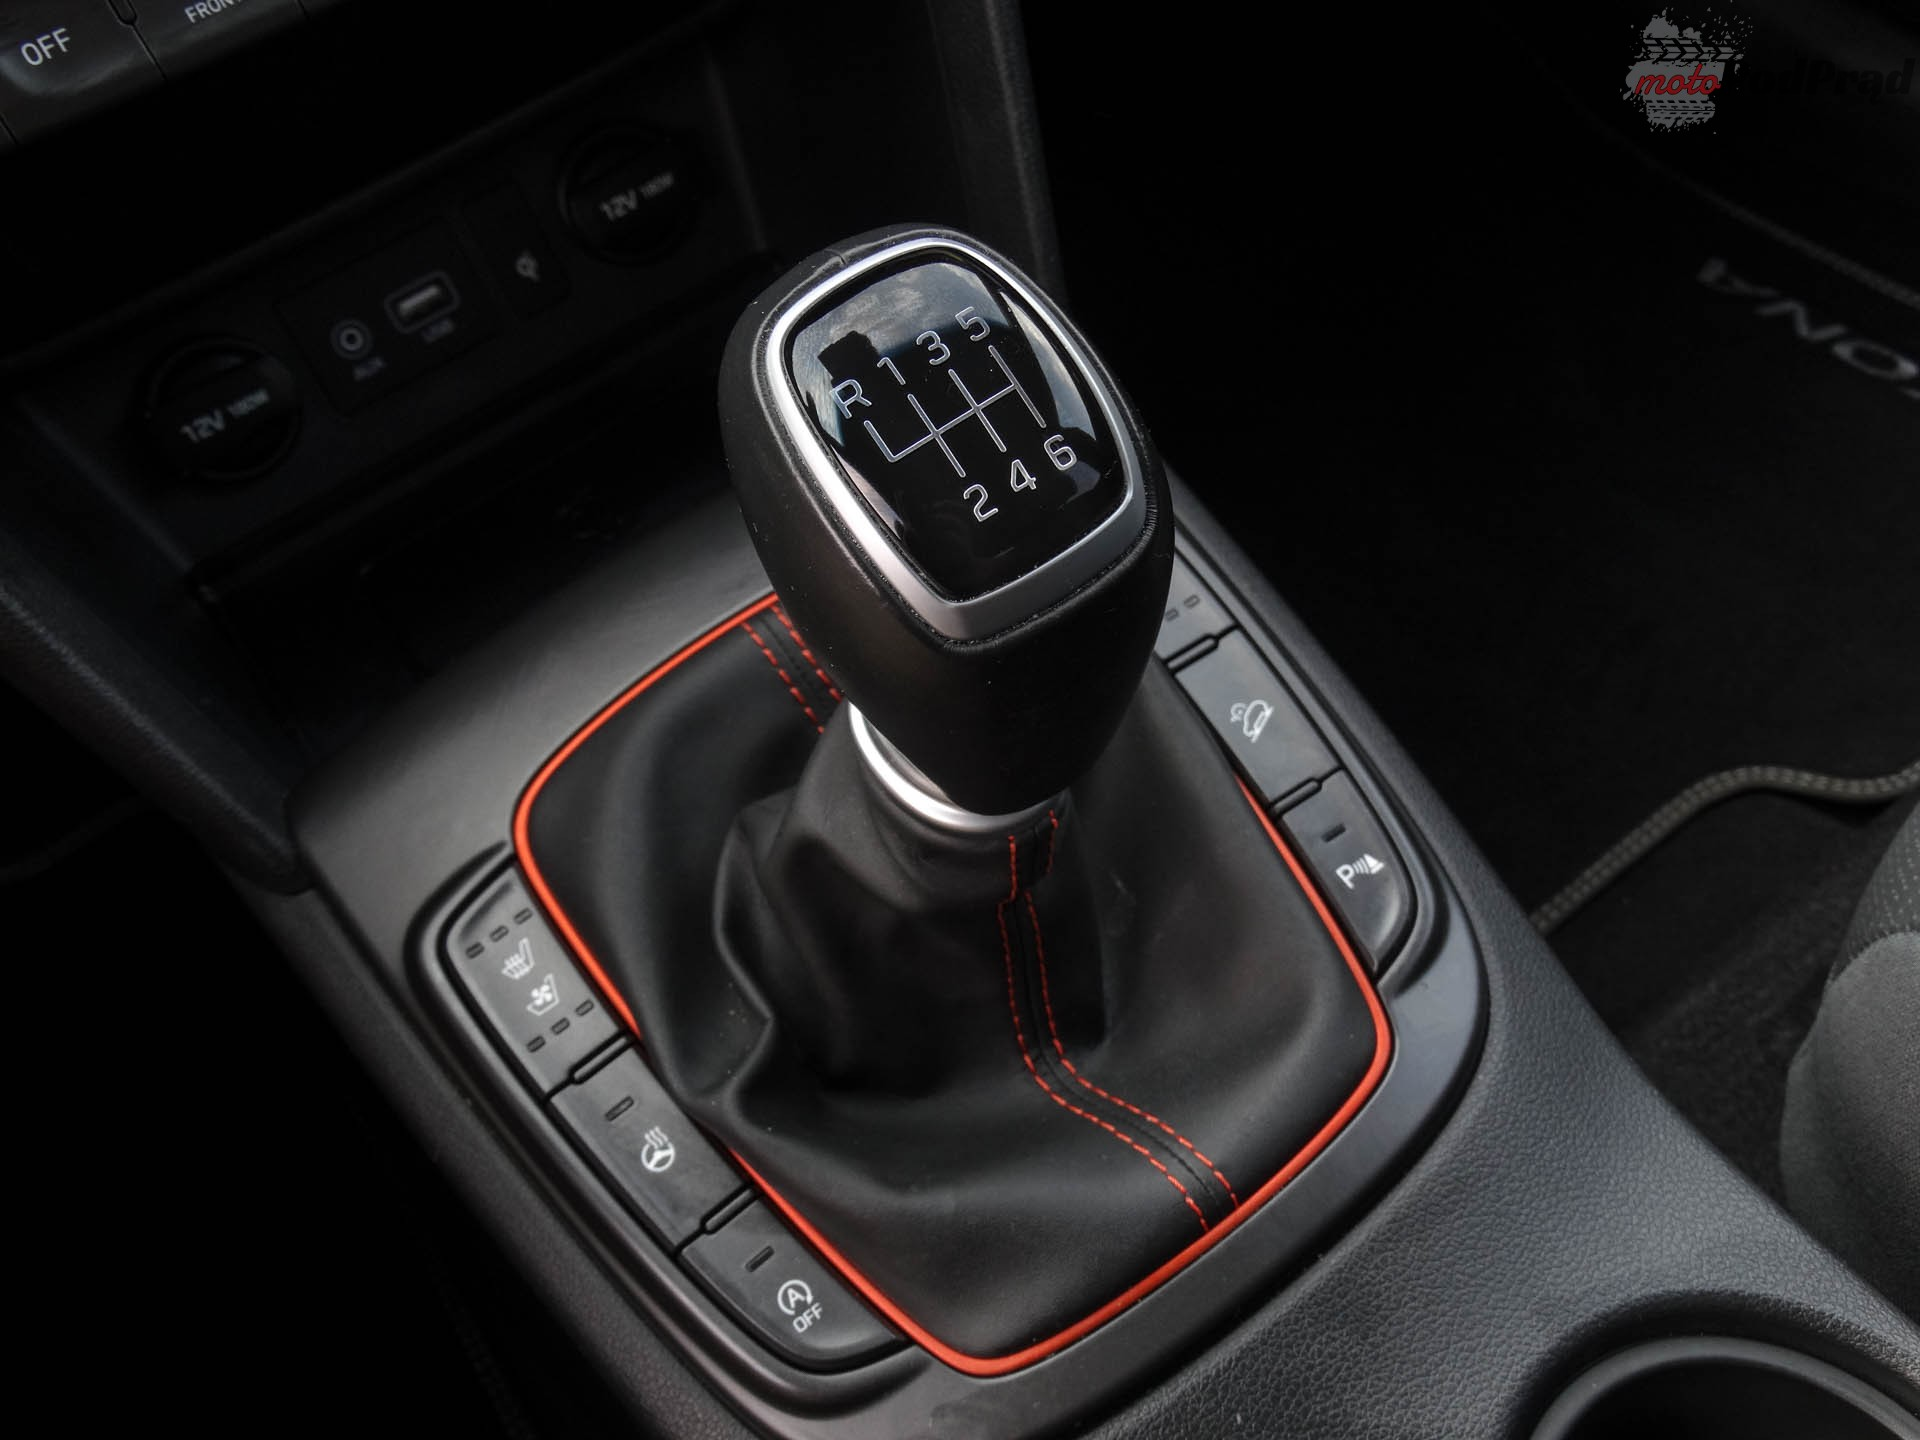 Hyundai Kona 16 Porównanie: Hyundai Kona 1.0 kontra Seat Arona 1.0